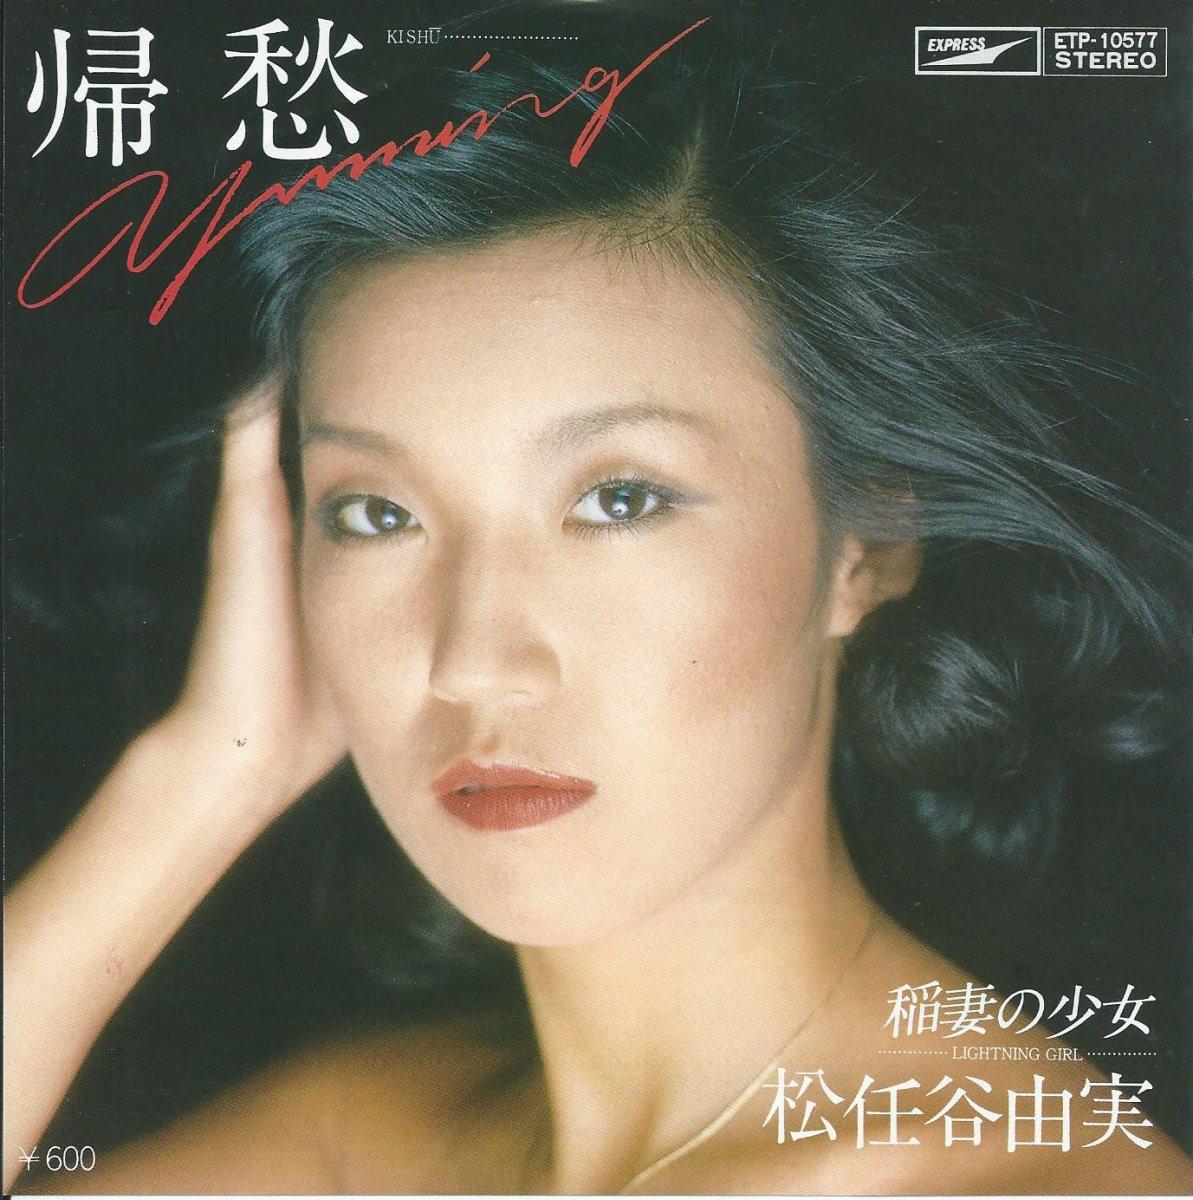 松任谷由実 YUMI MATSUTOYA (山下達郎) / 帰愁 (KISHU) / 稲妻の少女 LIGHTNING GIRL (7